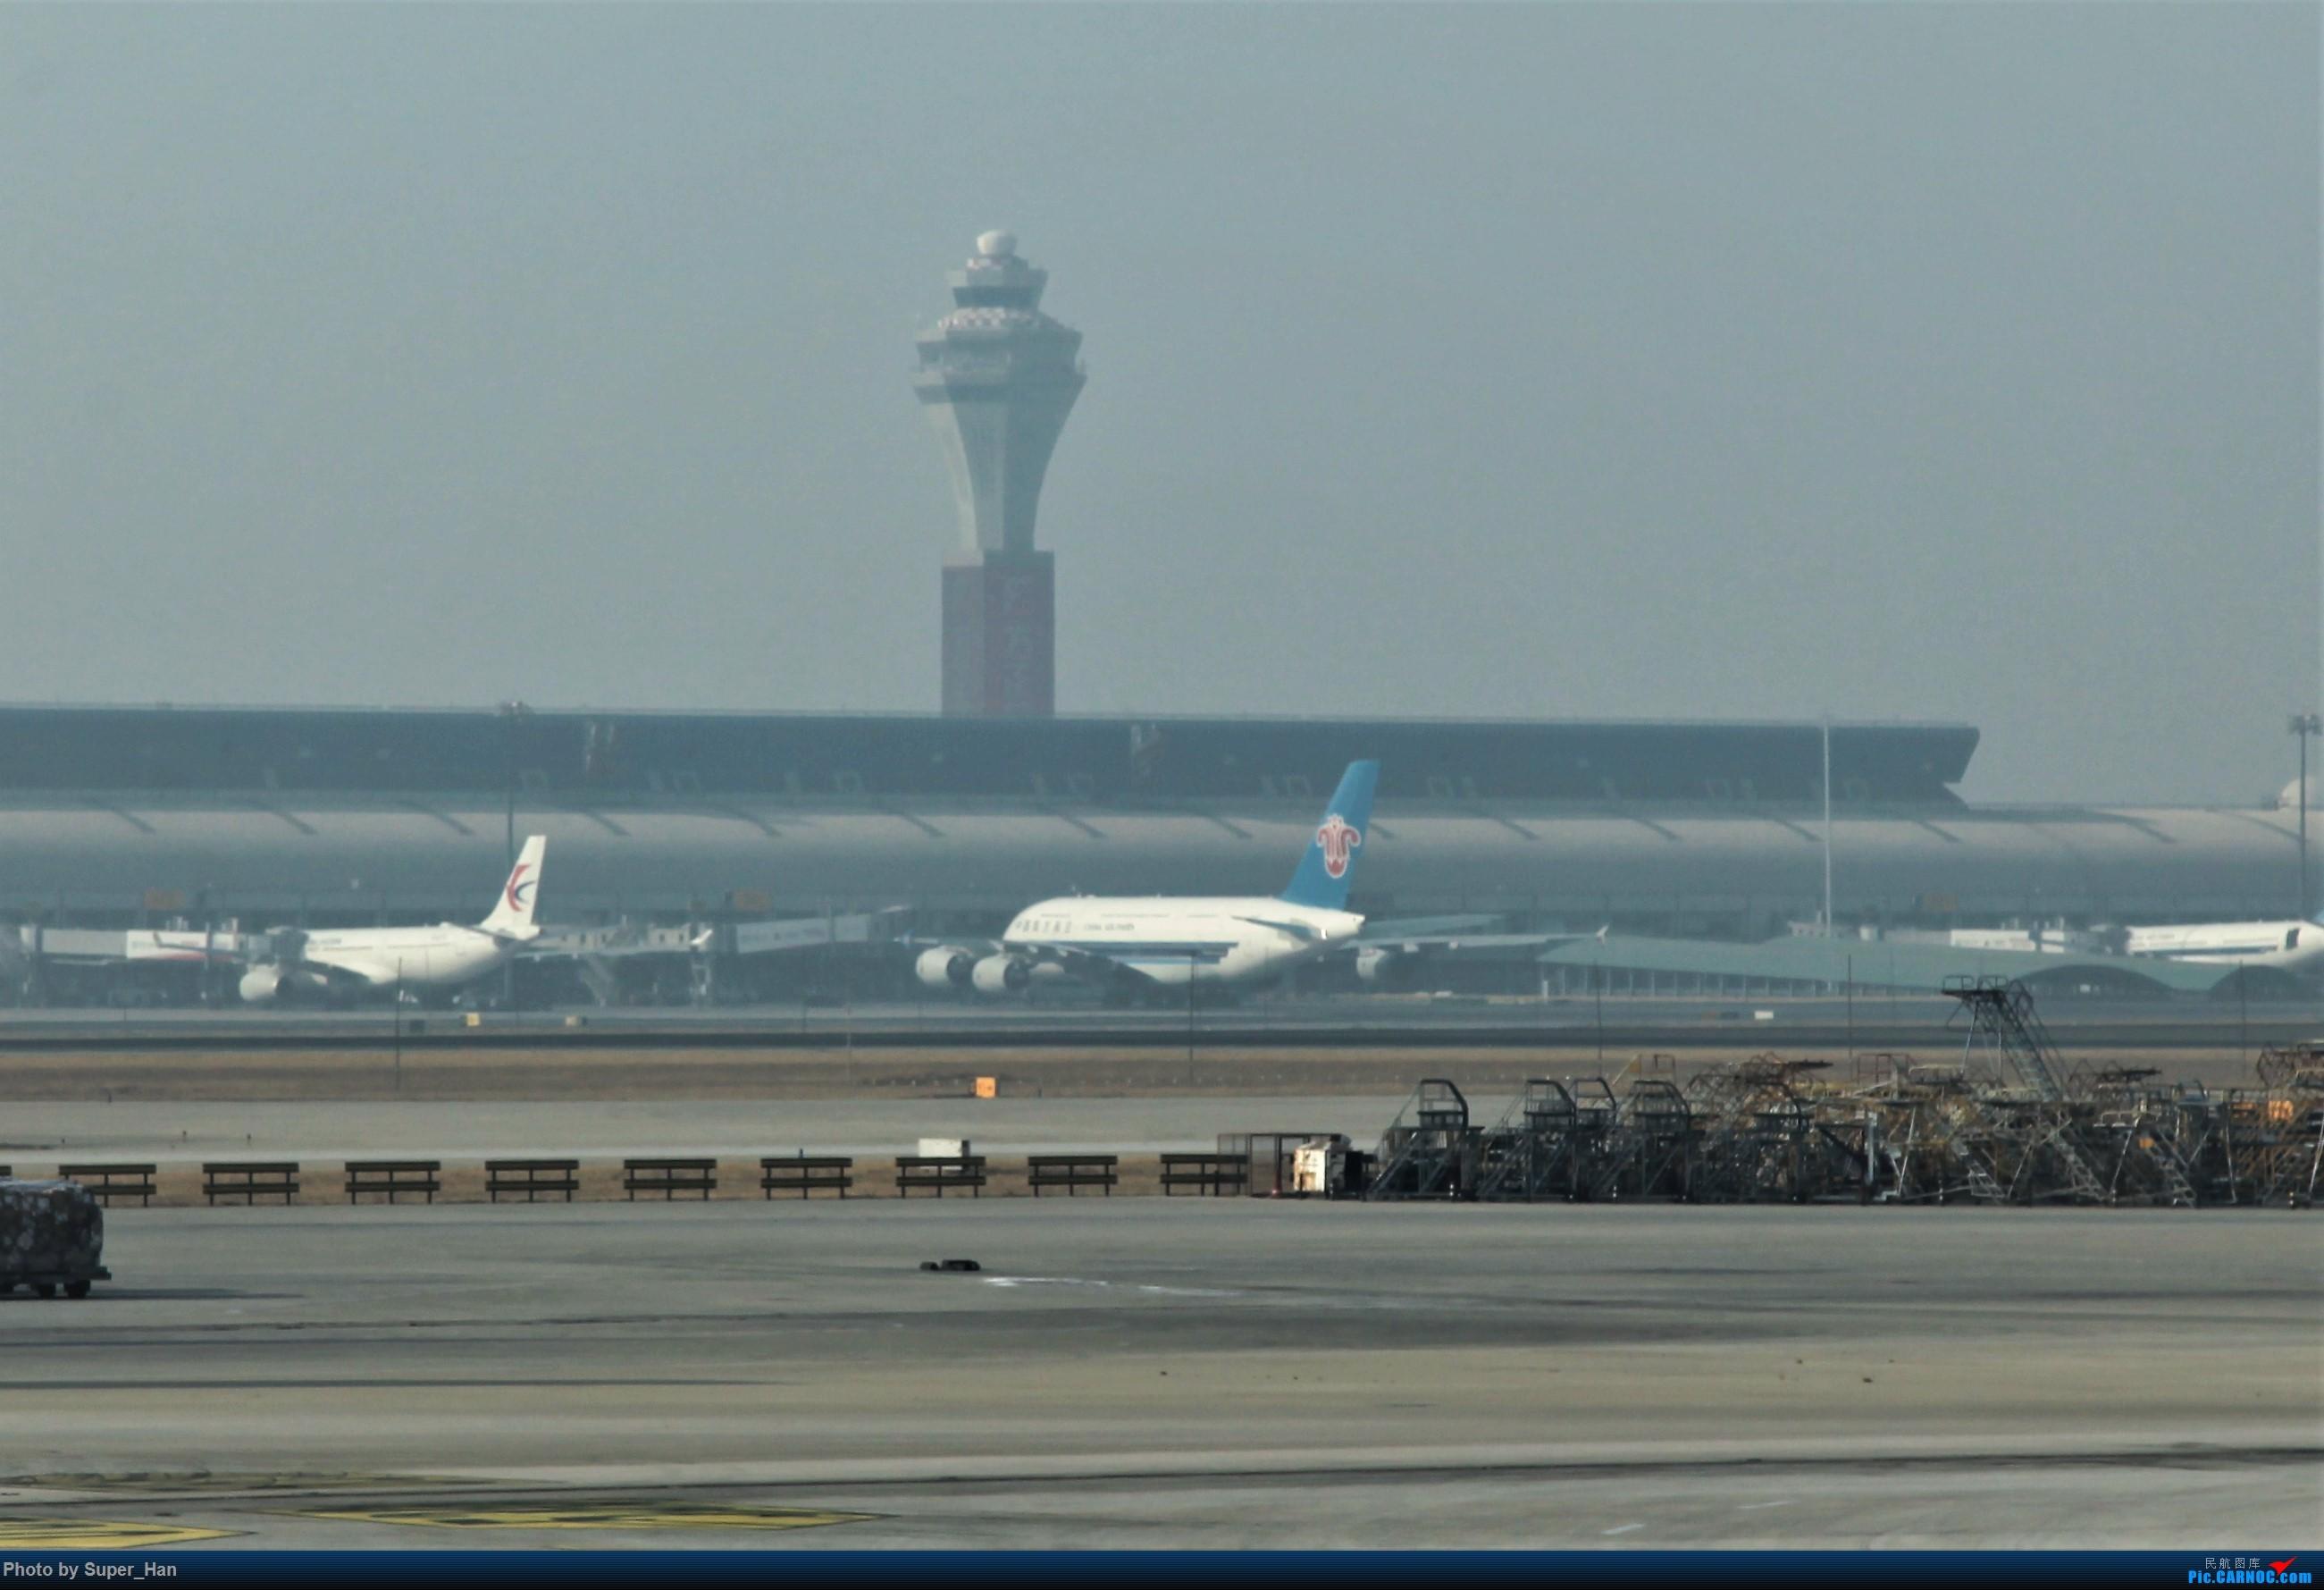 Re:[原创]2019虹桥出发飞北京第一拍 AIRBUS A380 B-6137 中国北京首都国际机场